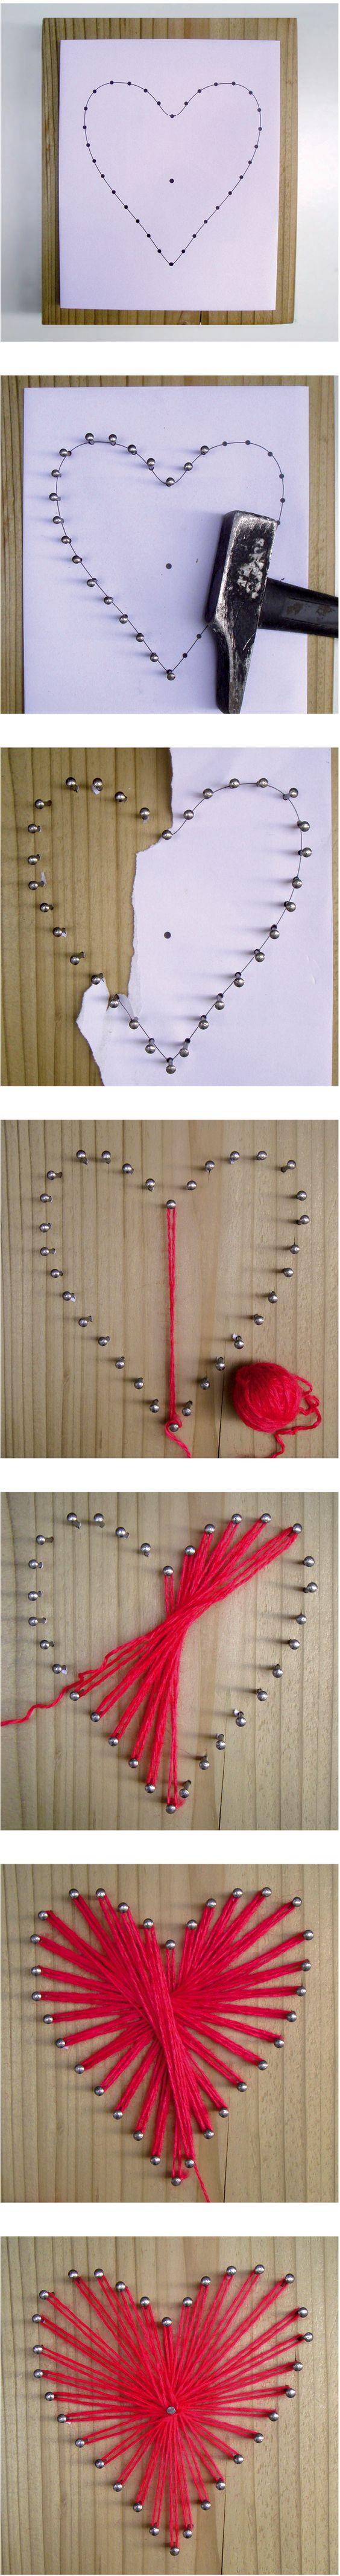 DIY : valentine's string art -  String Art Heart - cœur en fil tendu - tableau de fil - © solange abaziou - http://www.soyou.fr/: